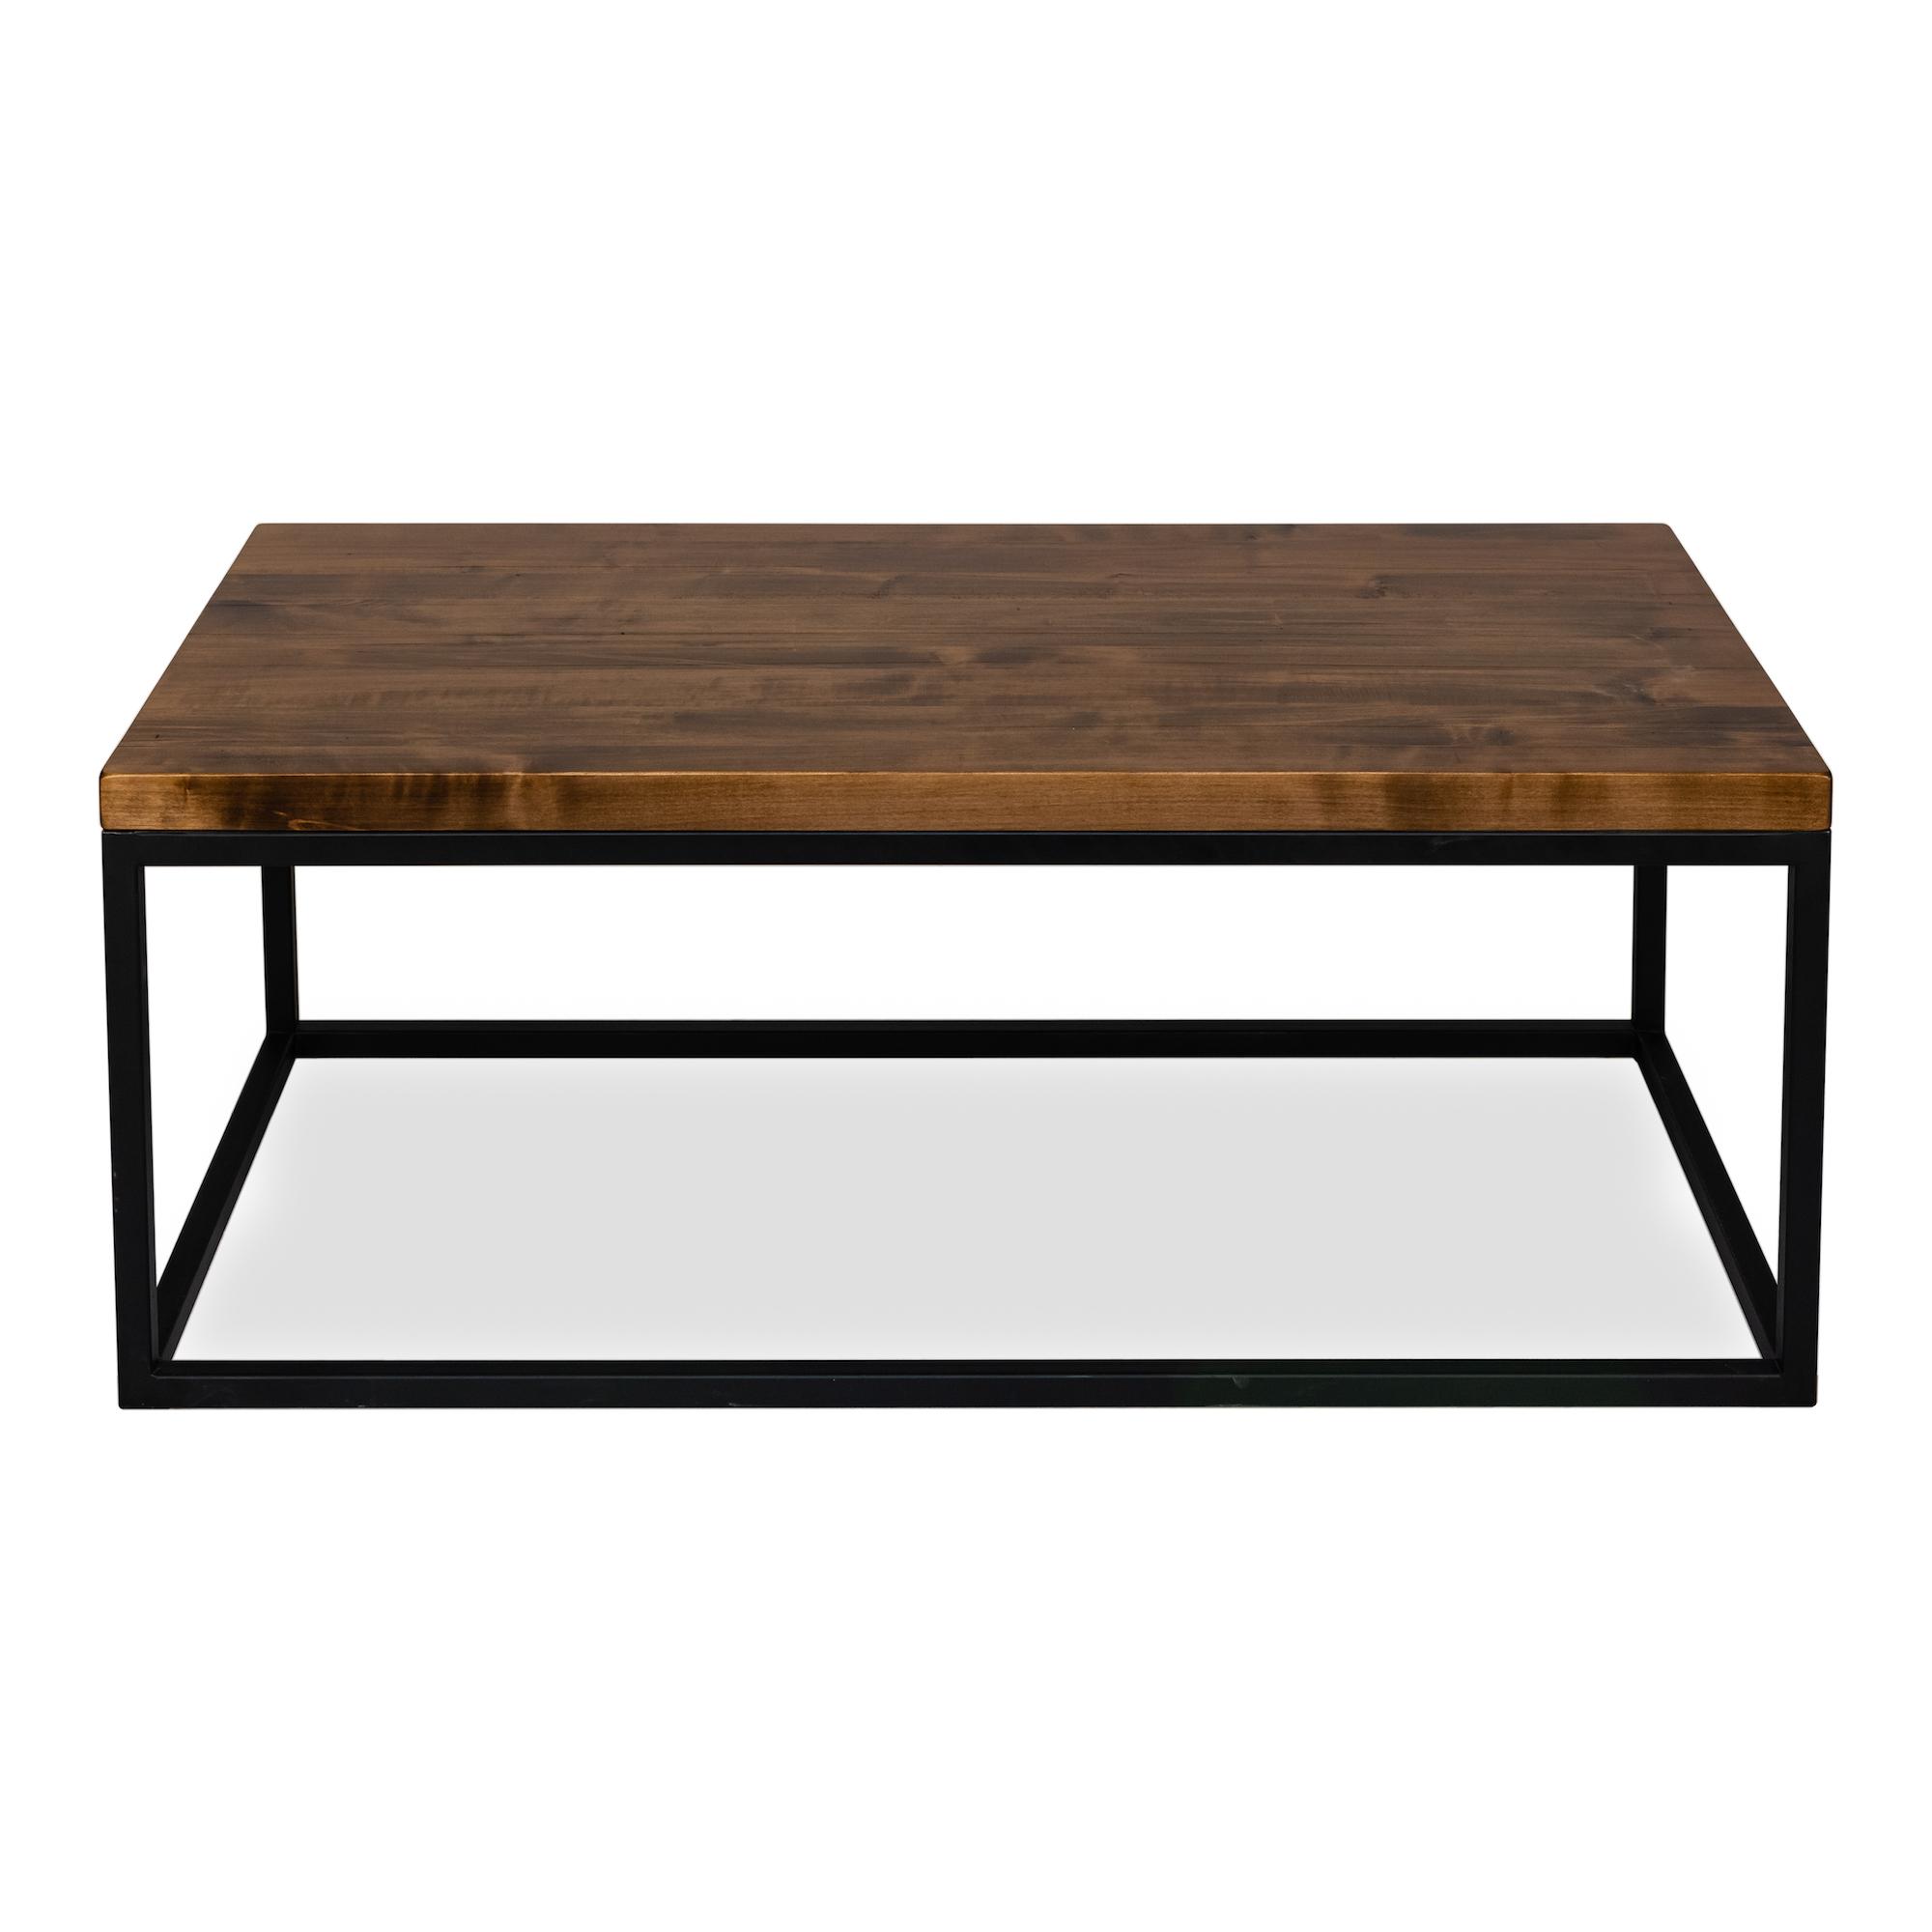 Woodcraft_Furniture_TubularCoffeeTable-1-1.jpg